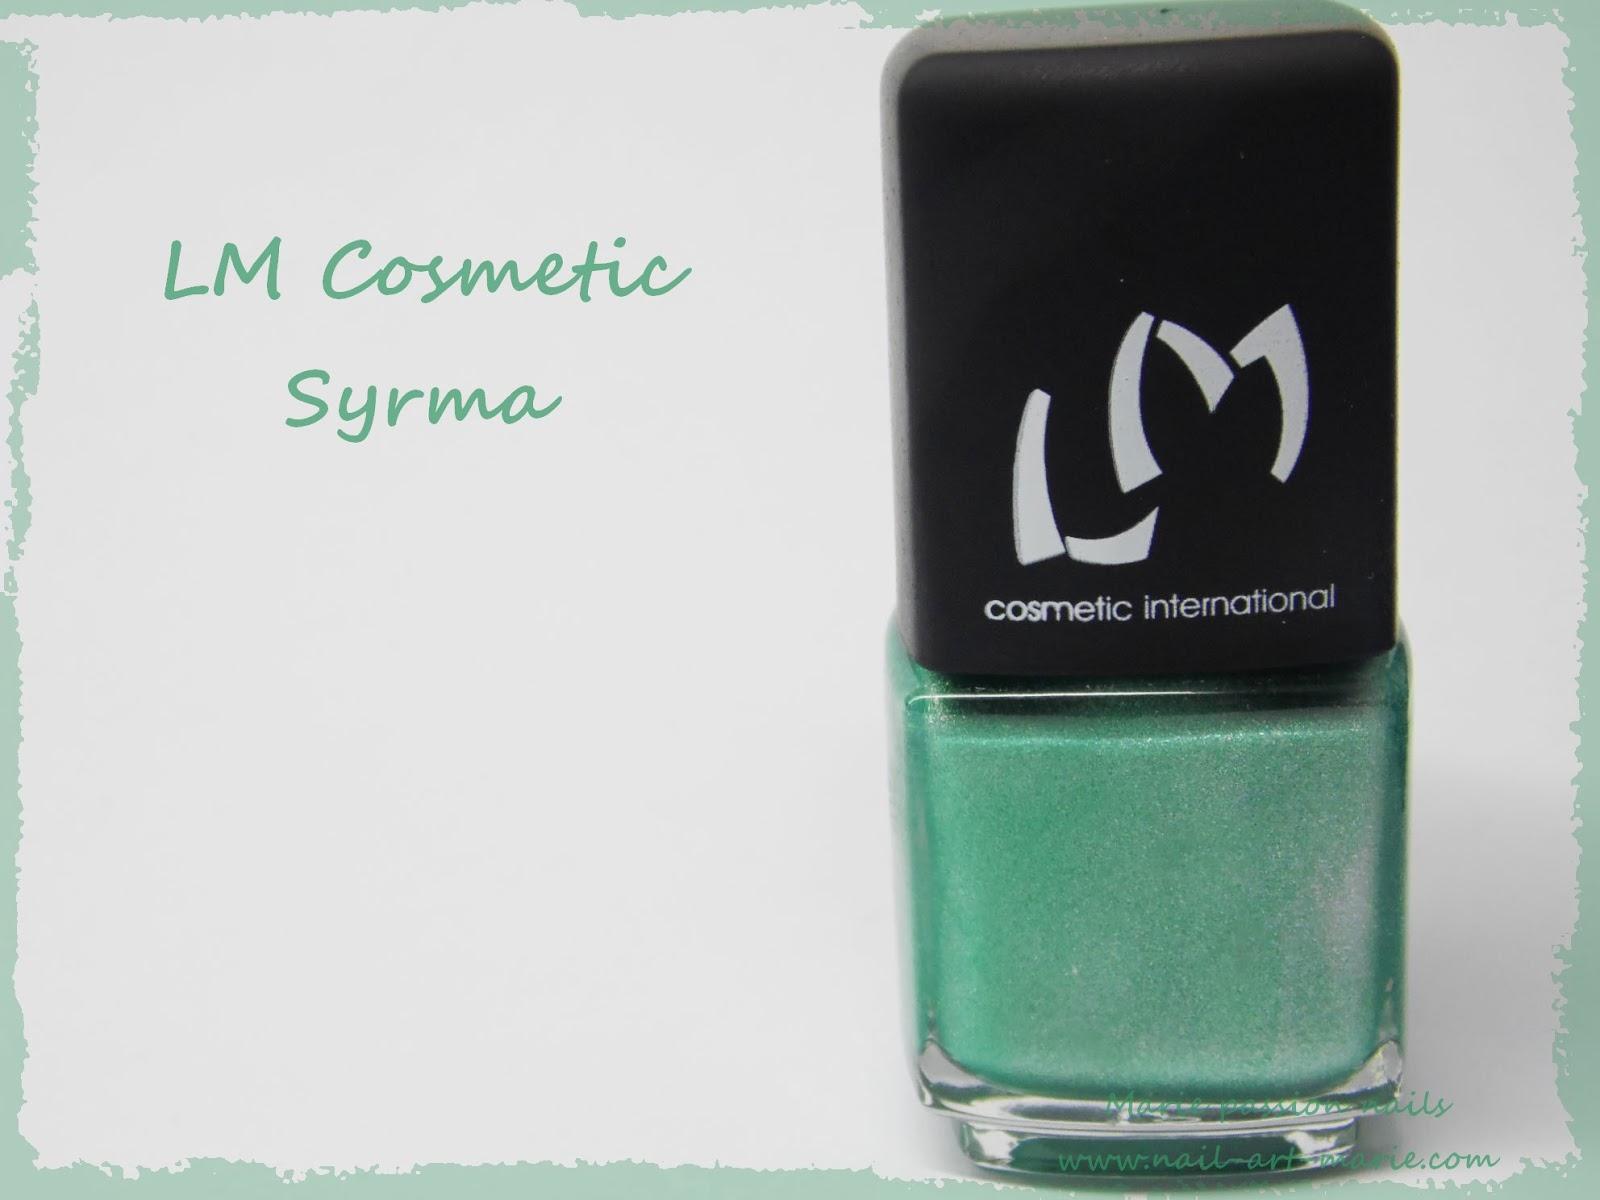 LM Cosmetic Syrma1